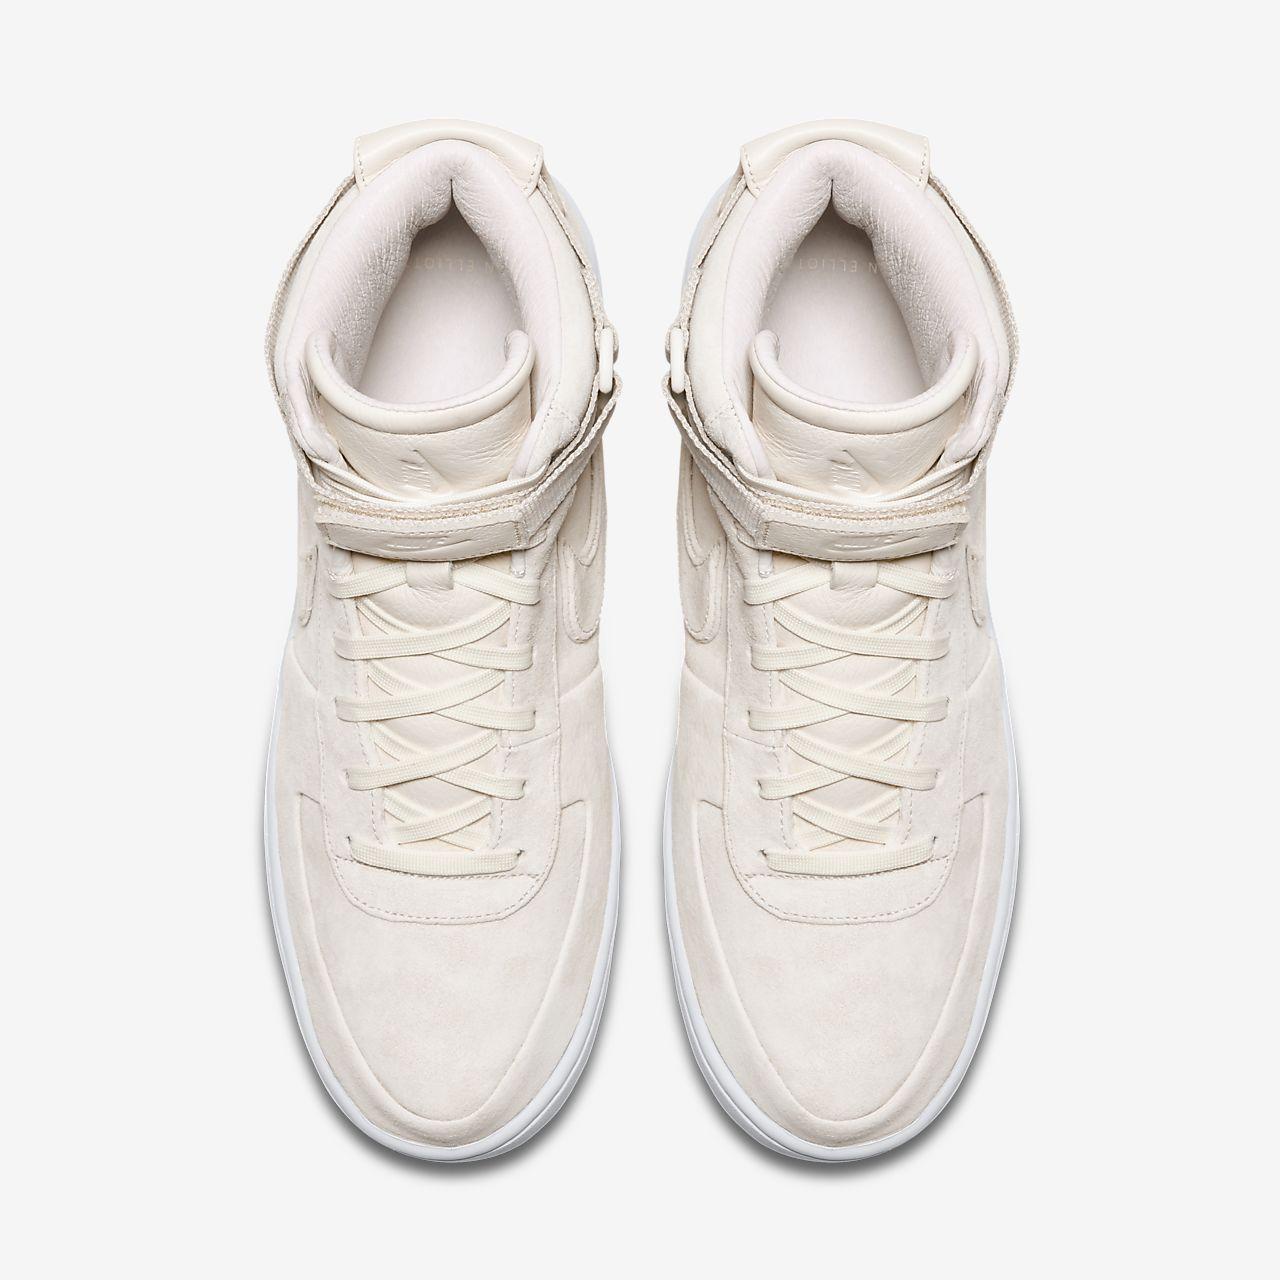 ... NikeLab Vandal High x John Elliott Men\u0027s Shoe